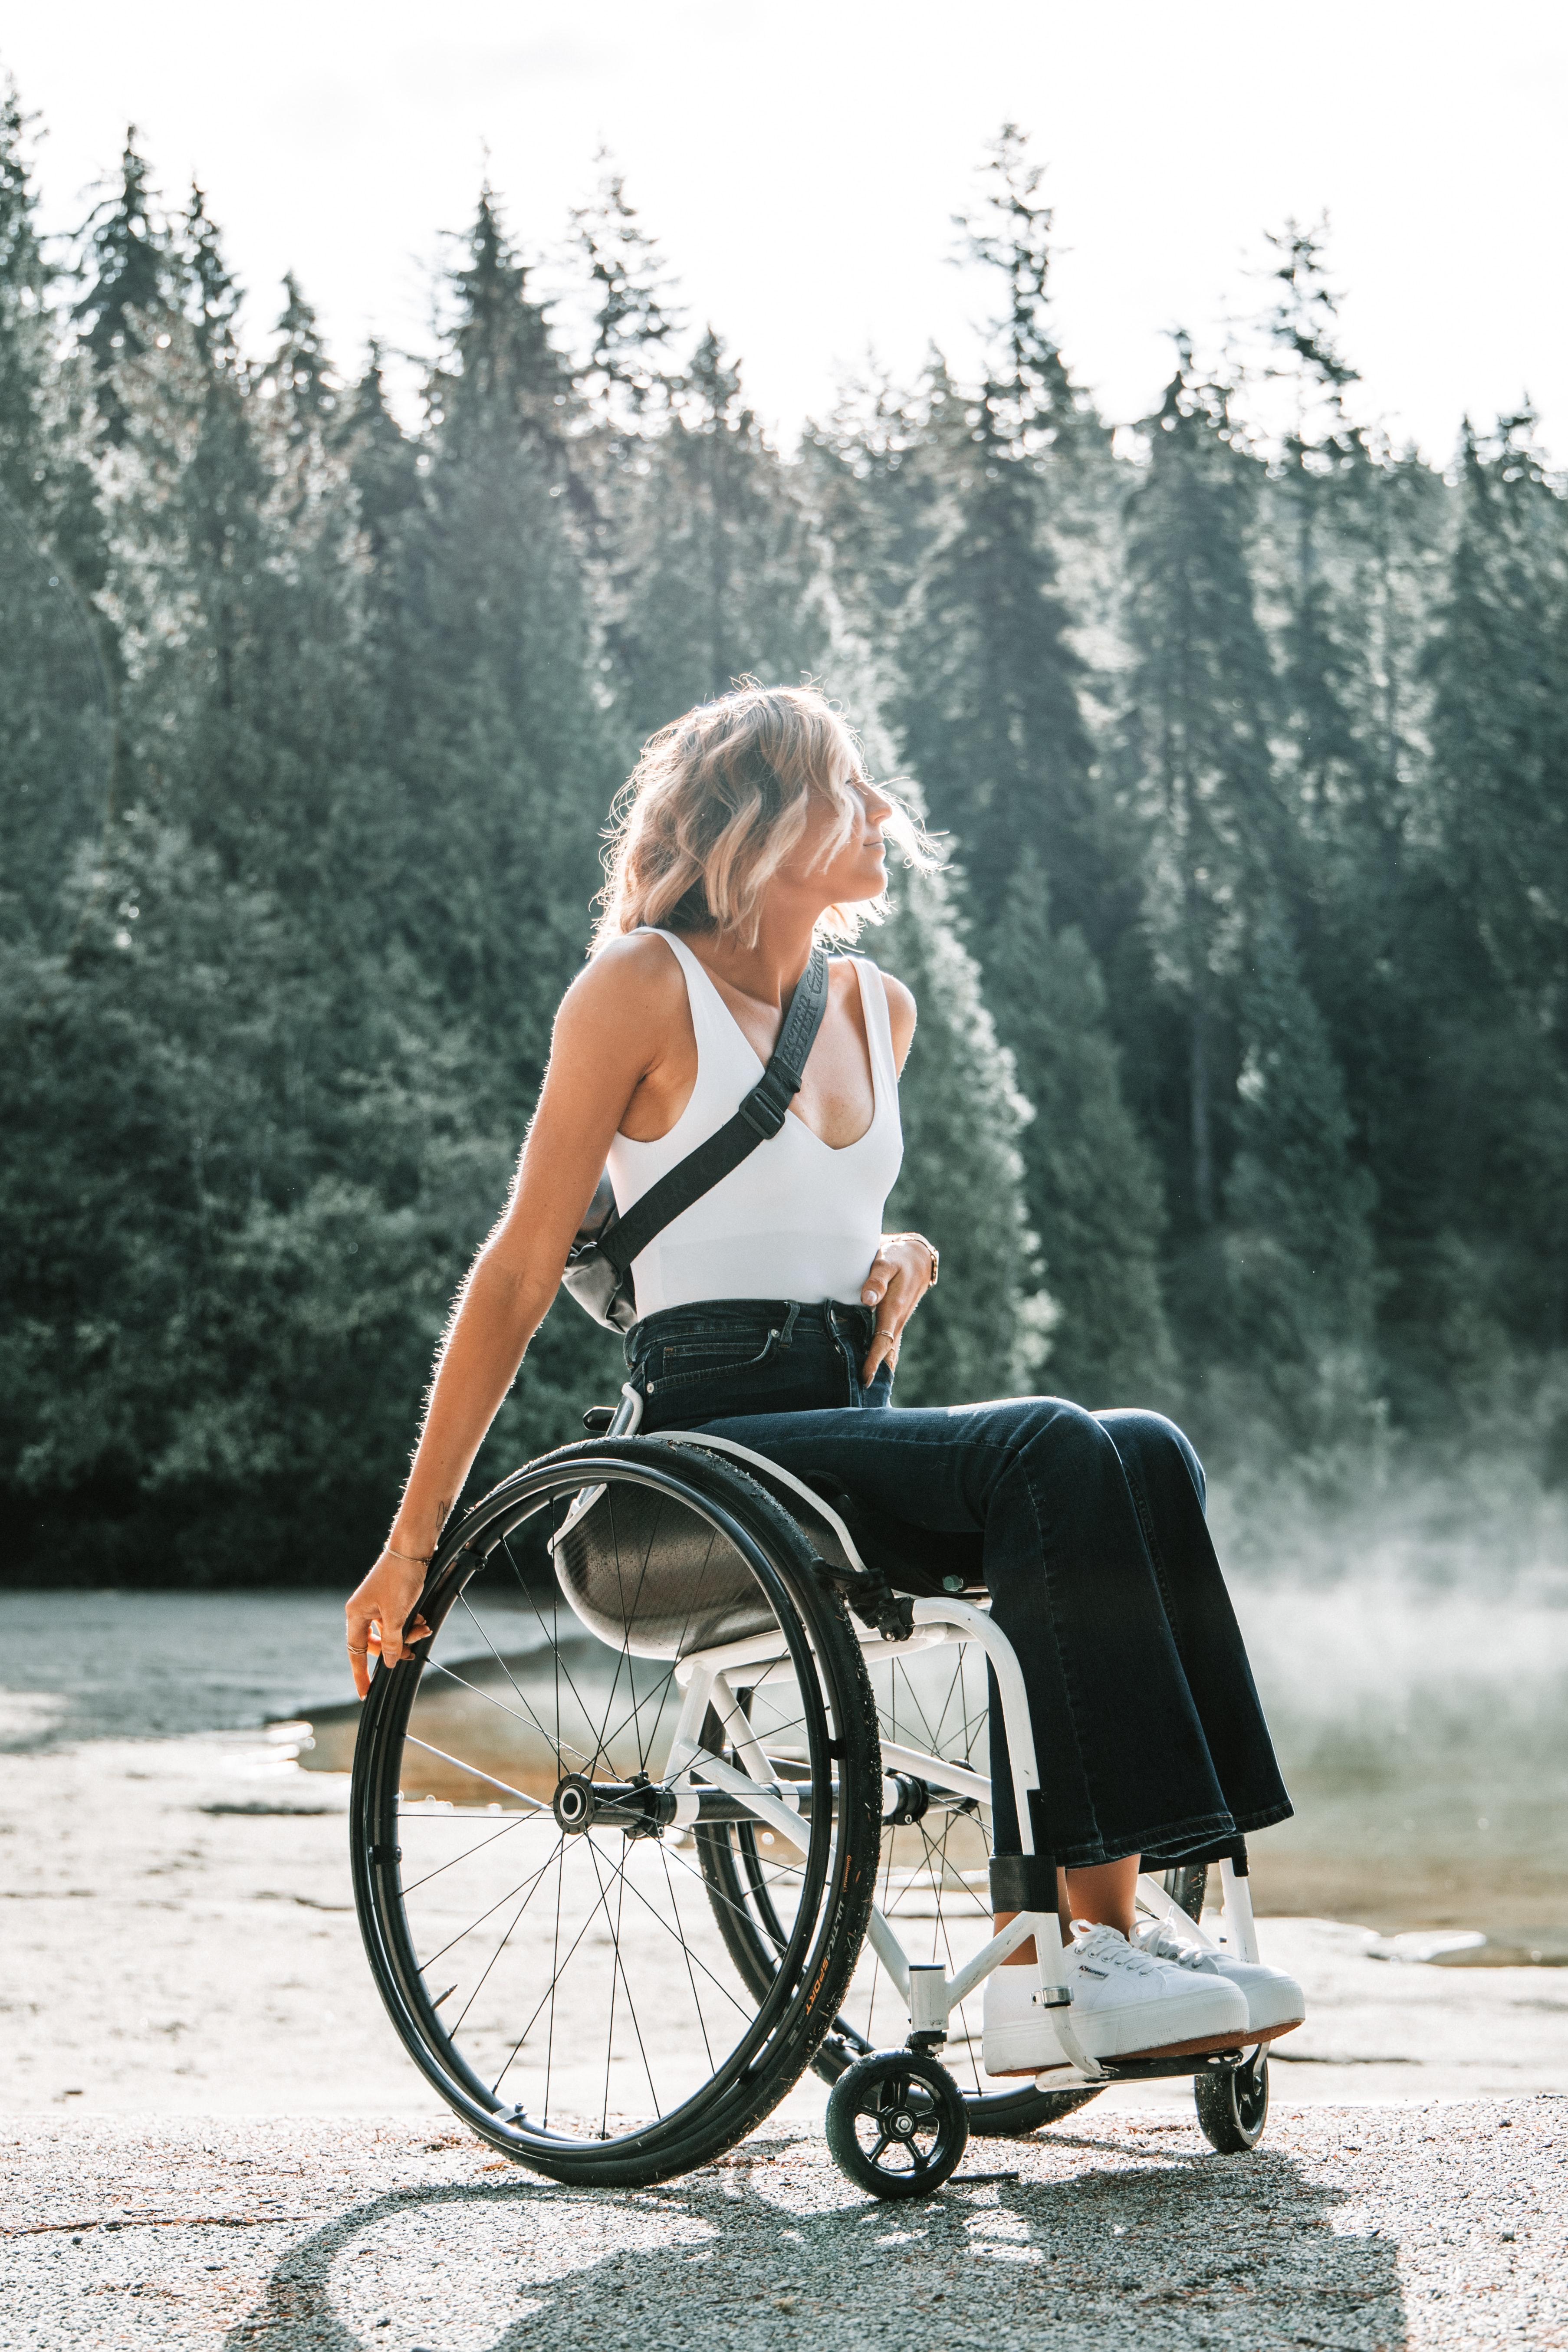 The Texas Loo ADA Regulation Pretty Girl in Wheelchair